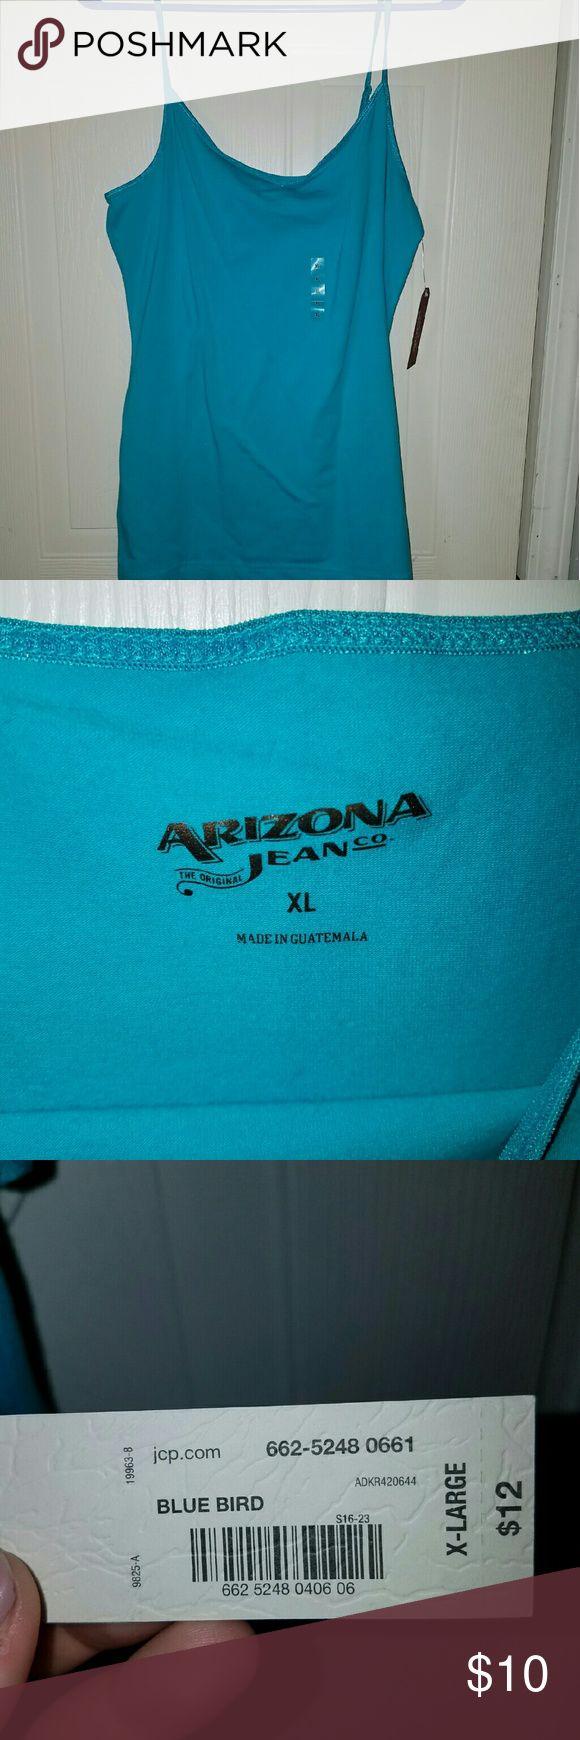 Blue cami Arizona blue cami. Never worn brand new with tags. Arizona Jean Company Tops Camisoles